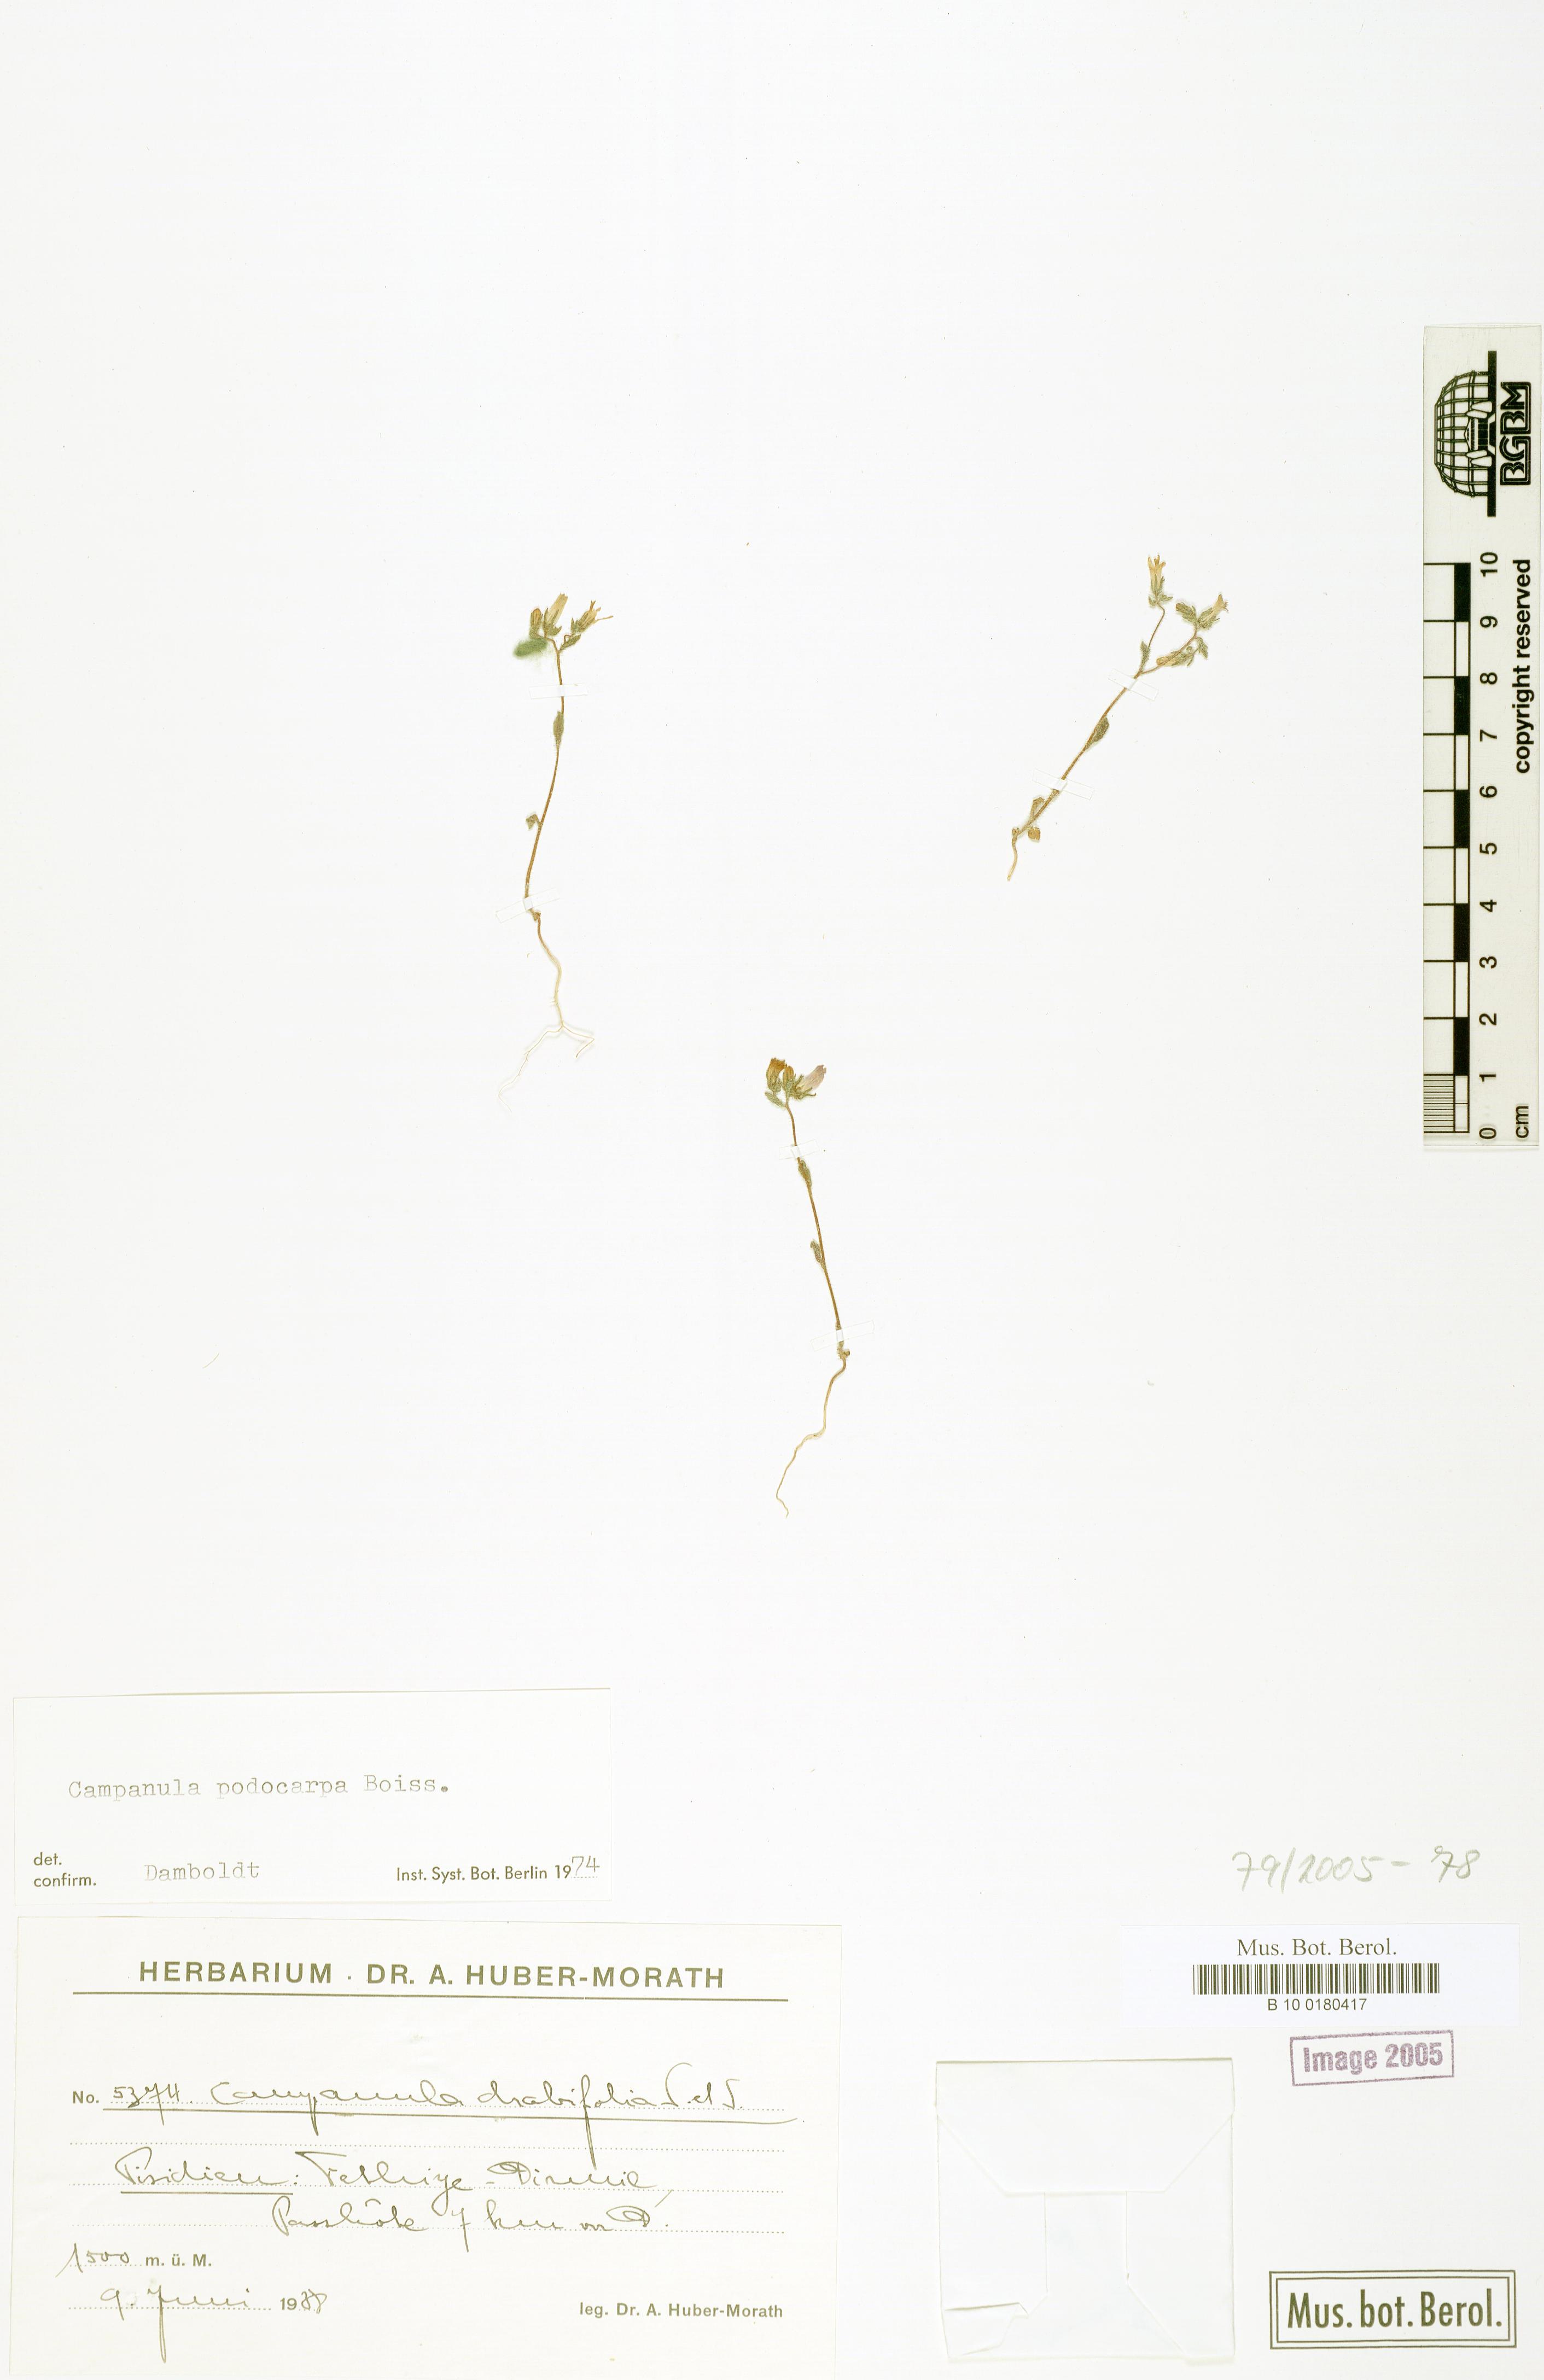 http://ww2.bgbm.org/herbarium/images/B/10/01/80/41/B_10_0180417.jpg